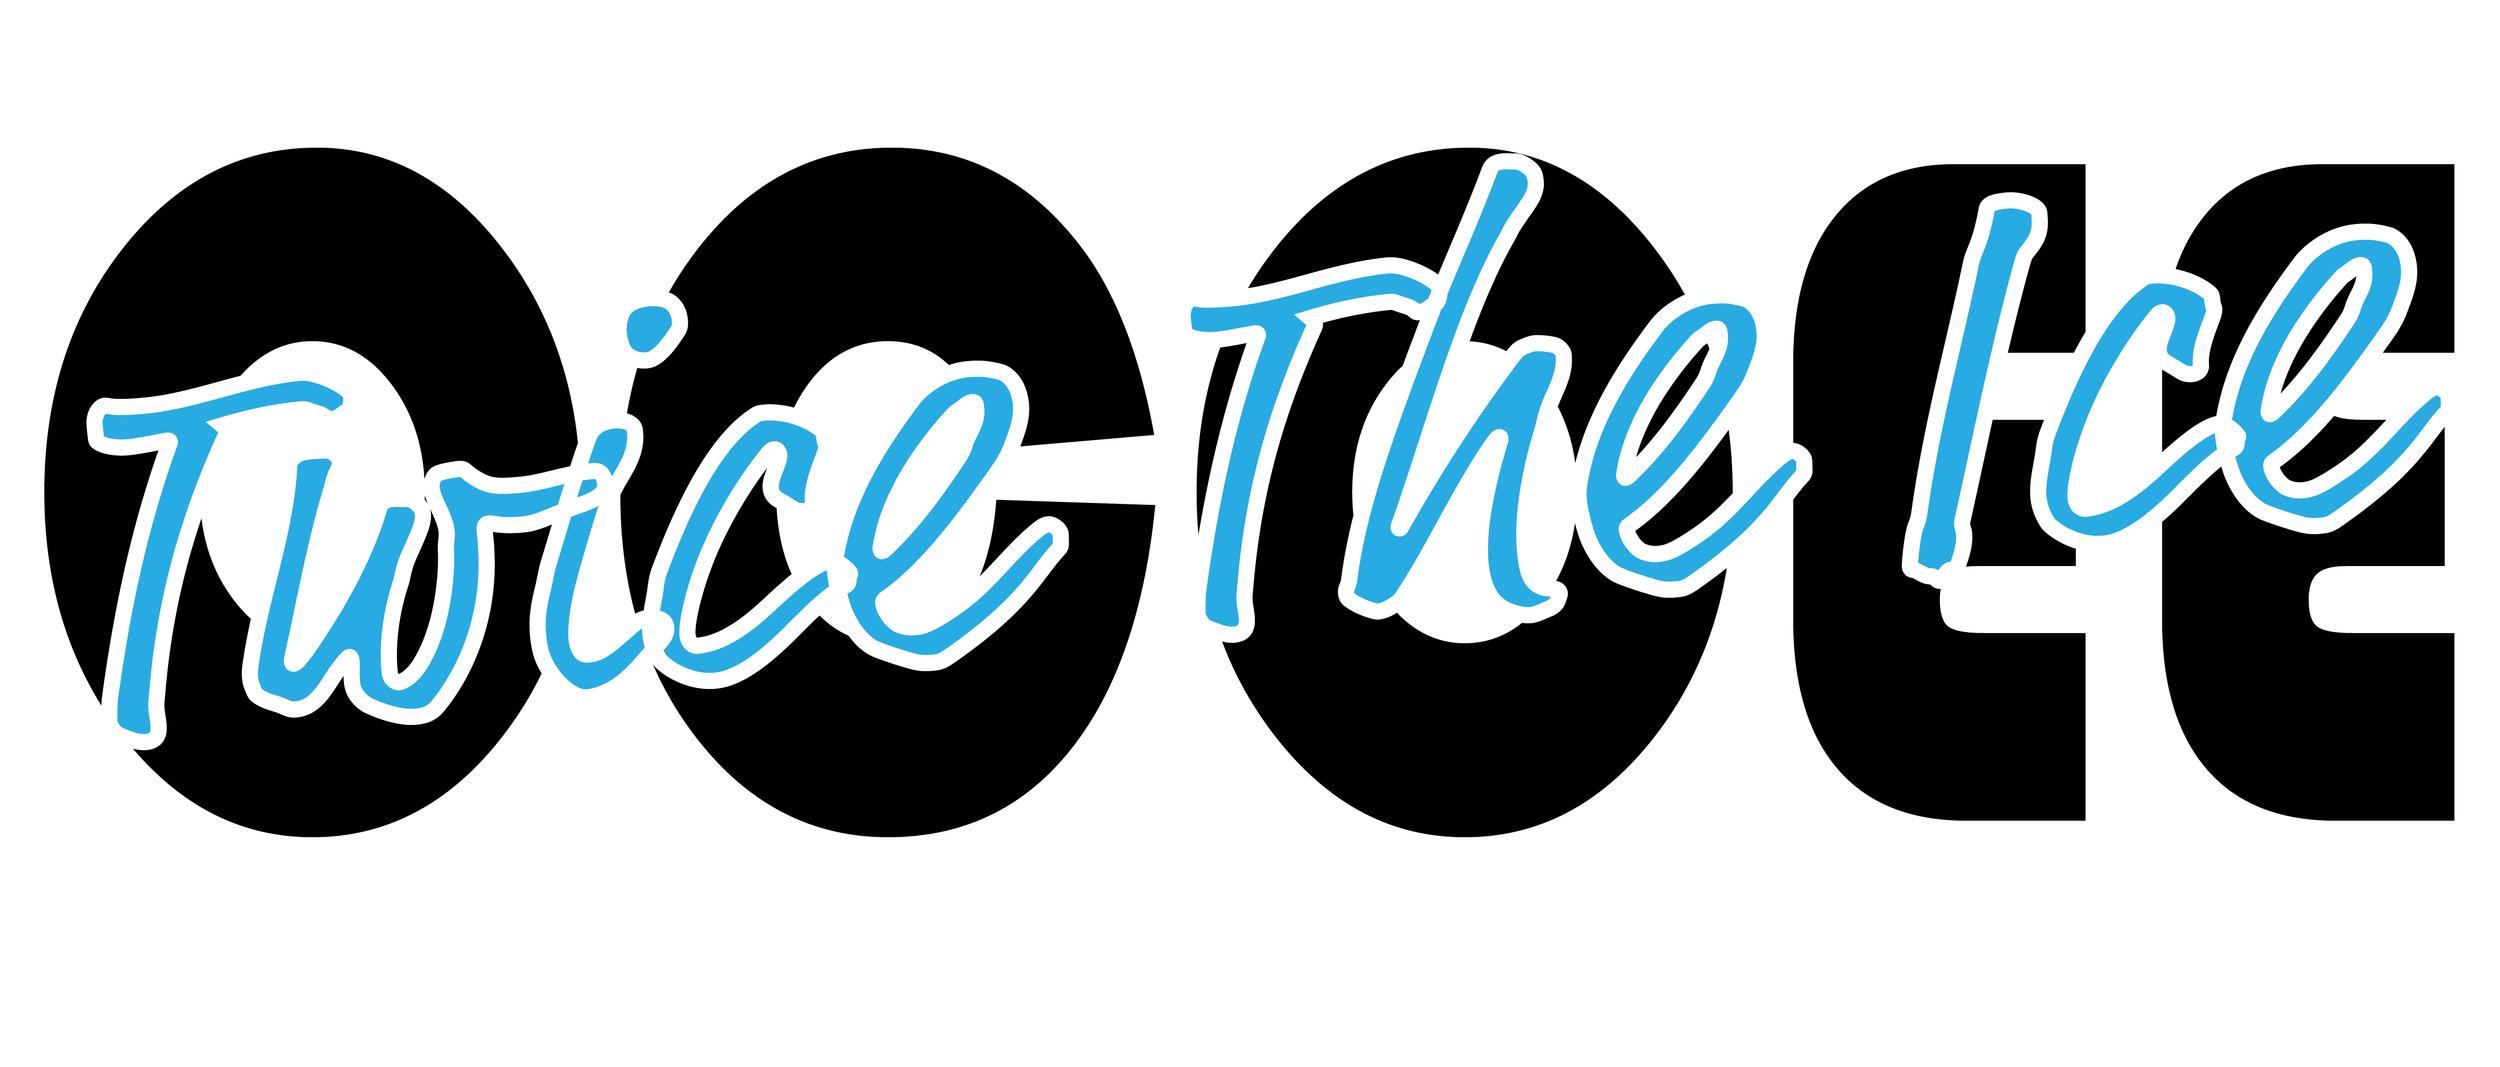 Ocoee twice the ice.jpg